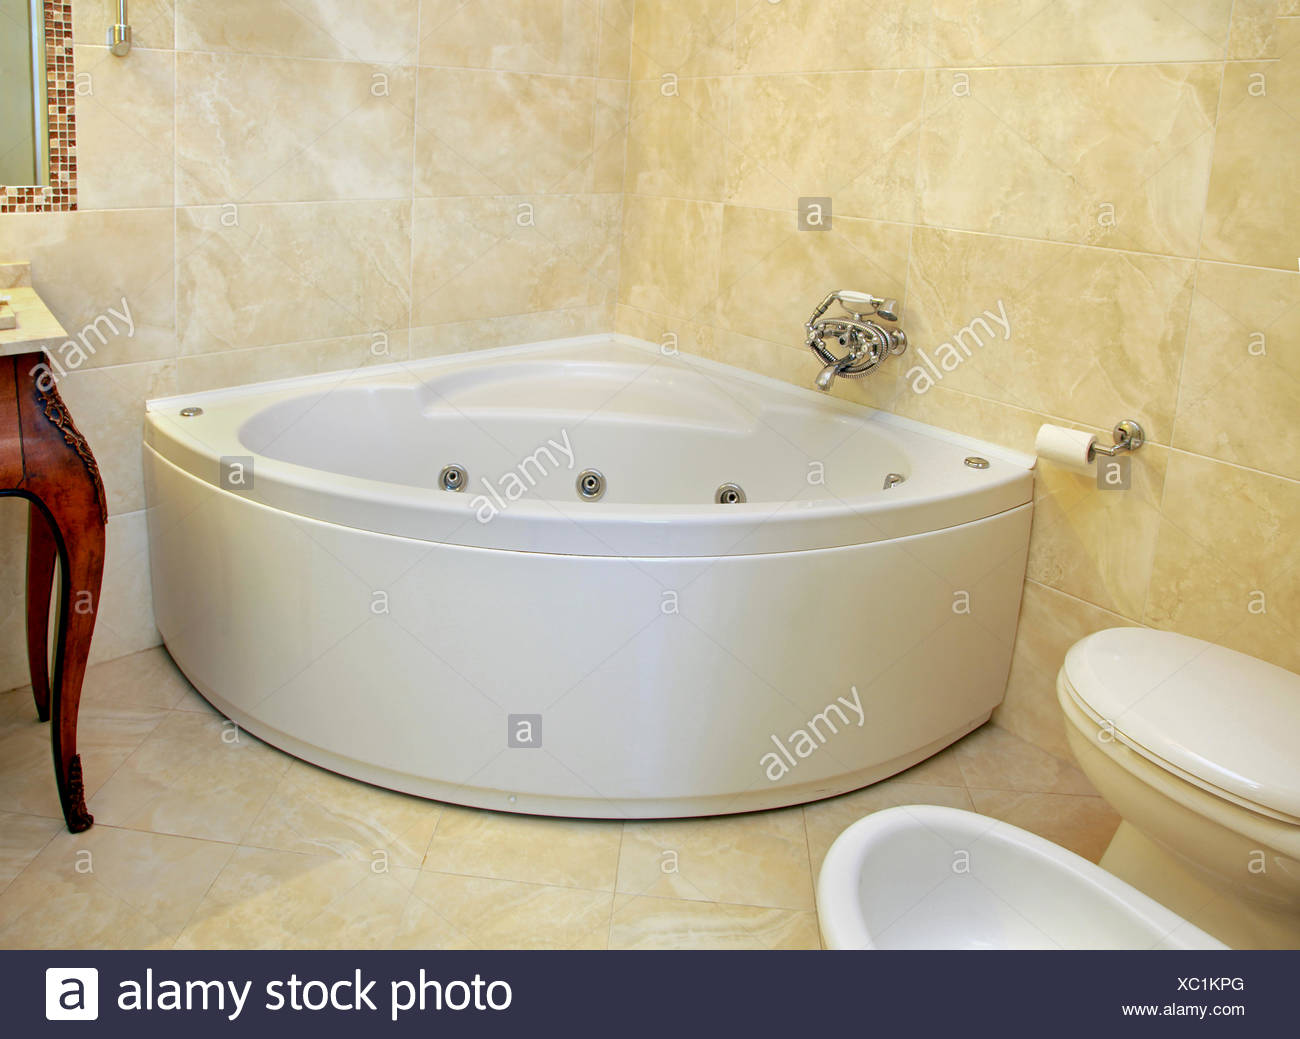 Corner Bathtub Stock Photos & Corner Bathtub Stock Images - Alamy